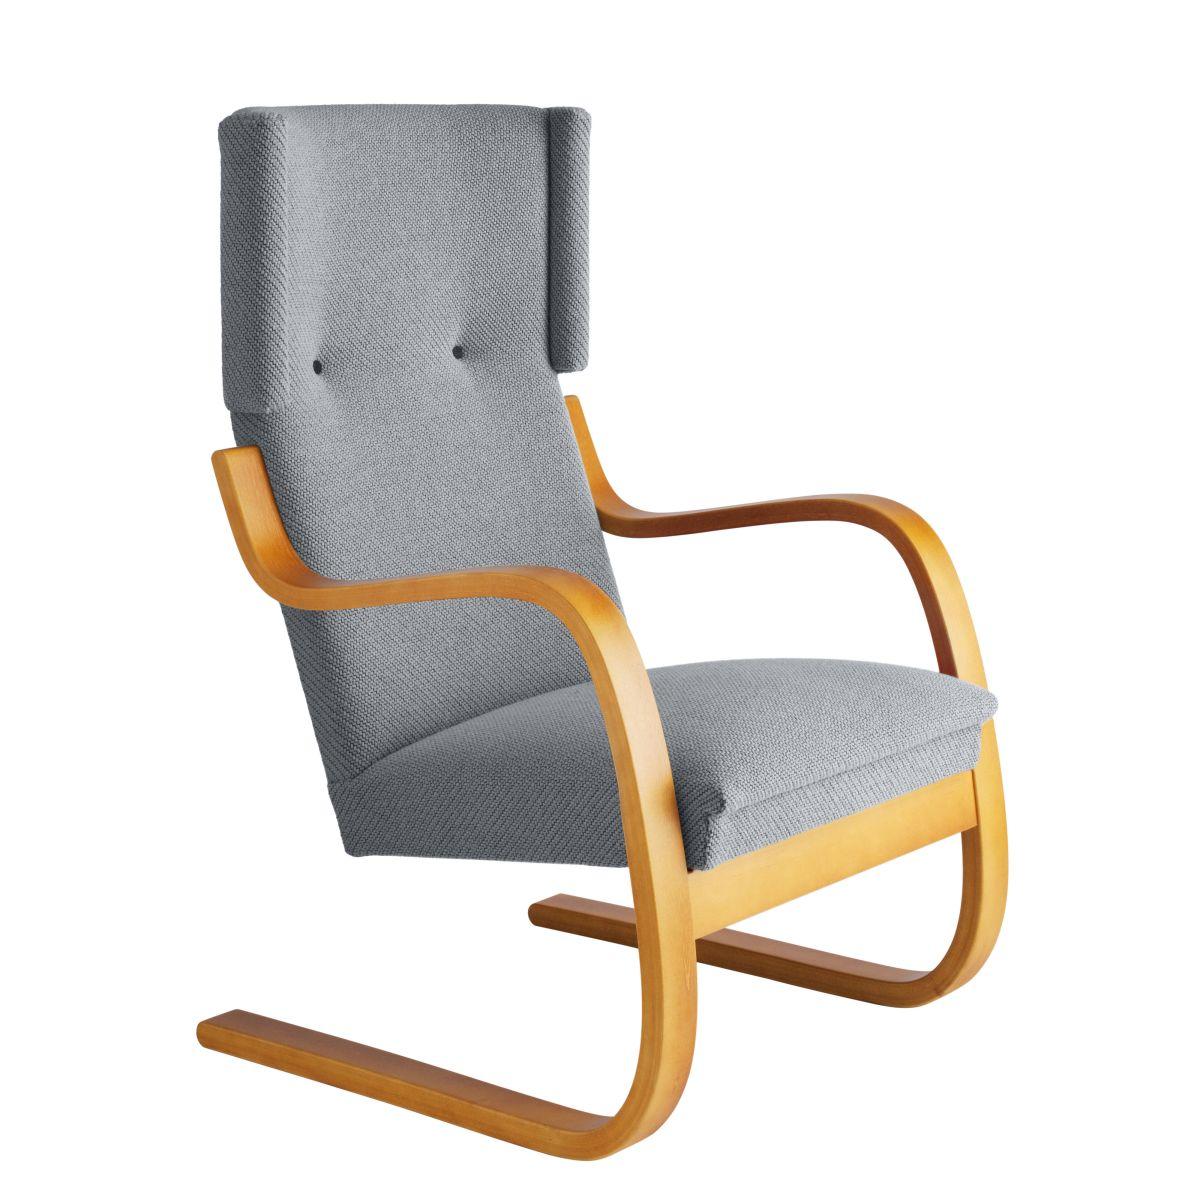 Armchair 401 Honey Stain Seat Fabric Upholstery Artek Grey 2494503